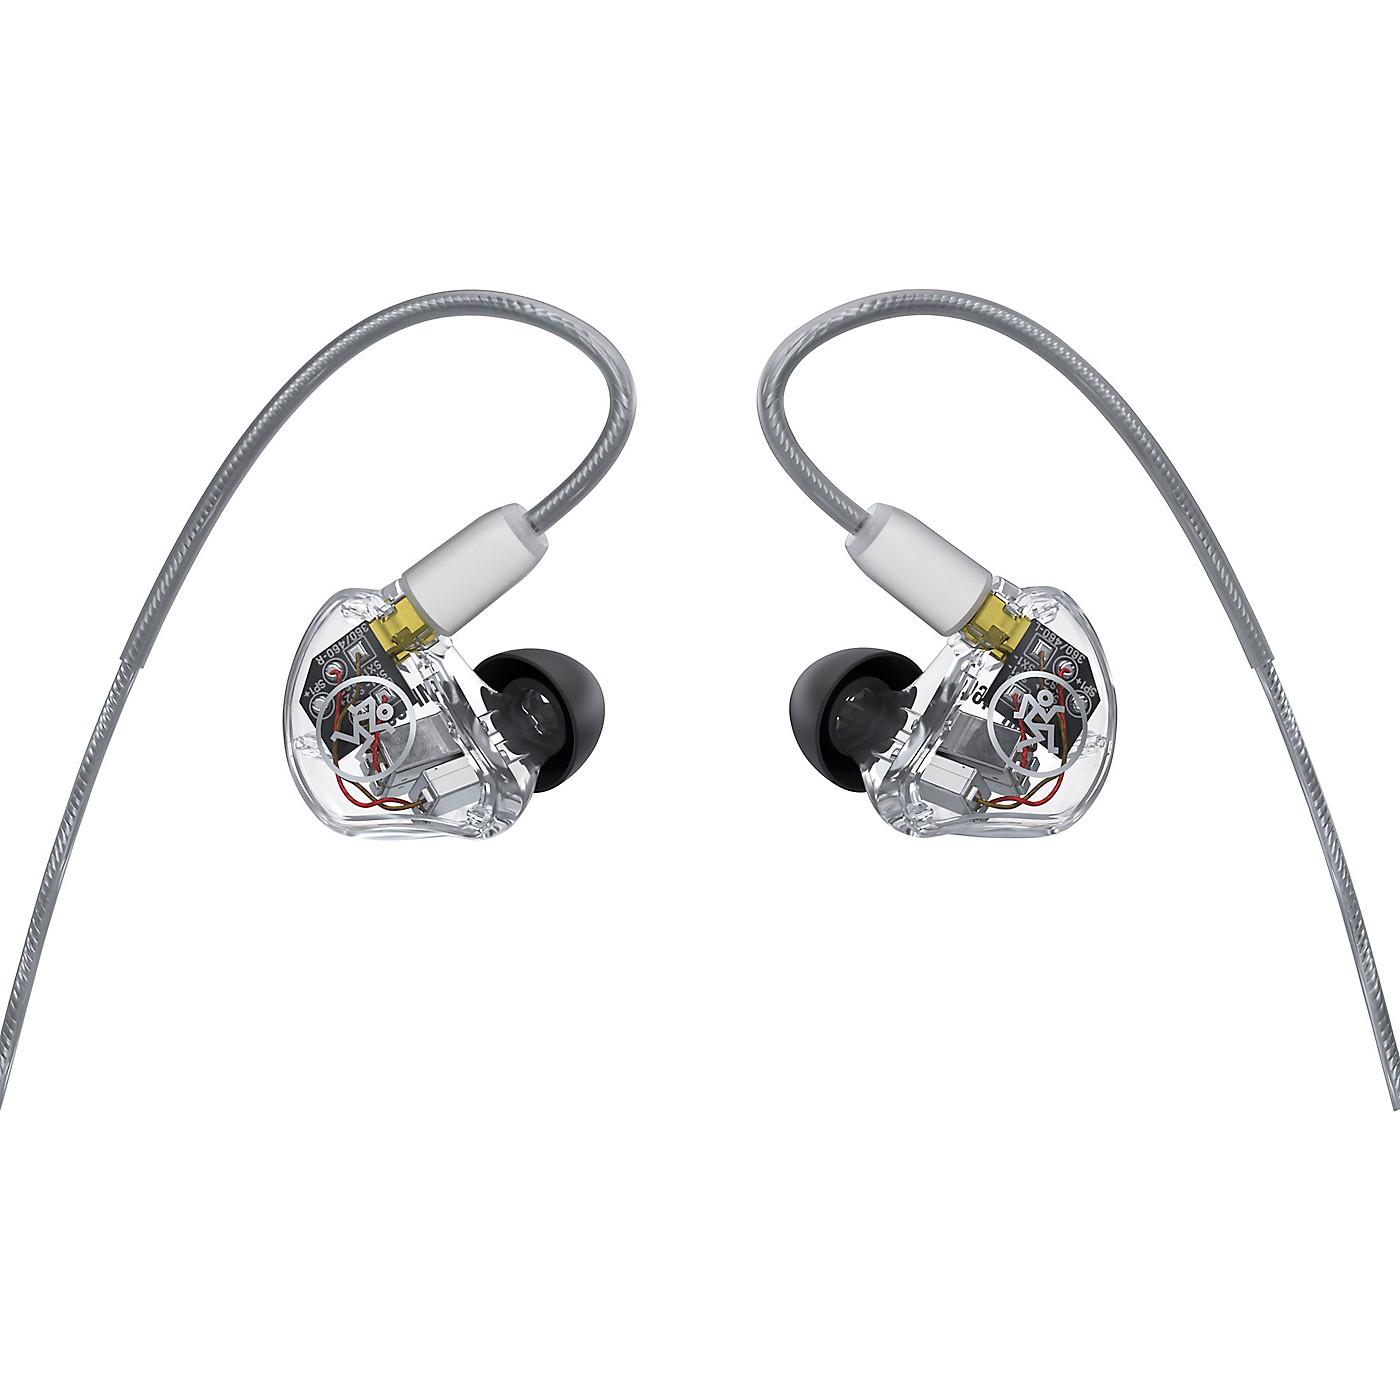 Mackie MP-360 In-Ear Monitors With Triple Balanced Armature thumbnail